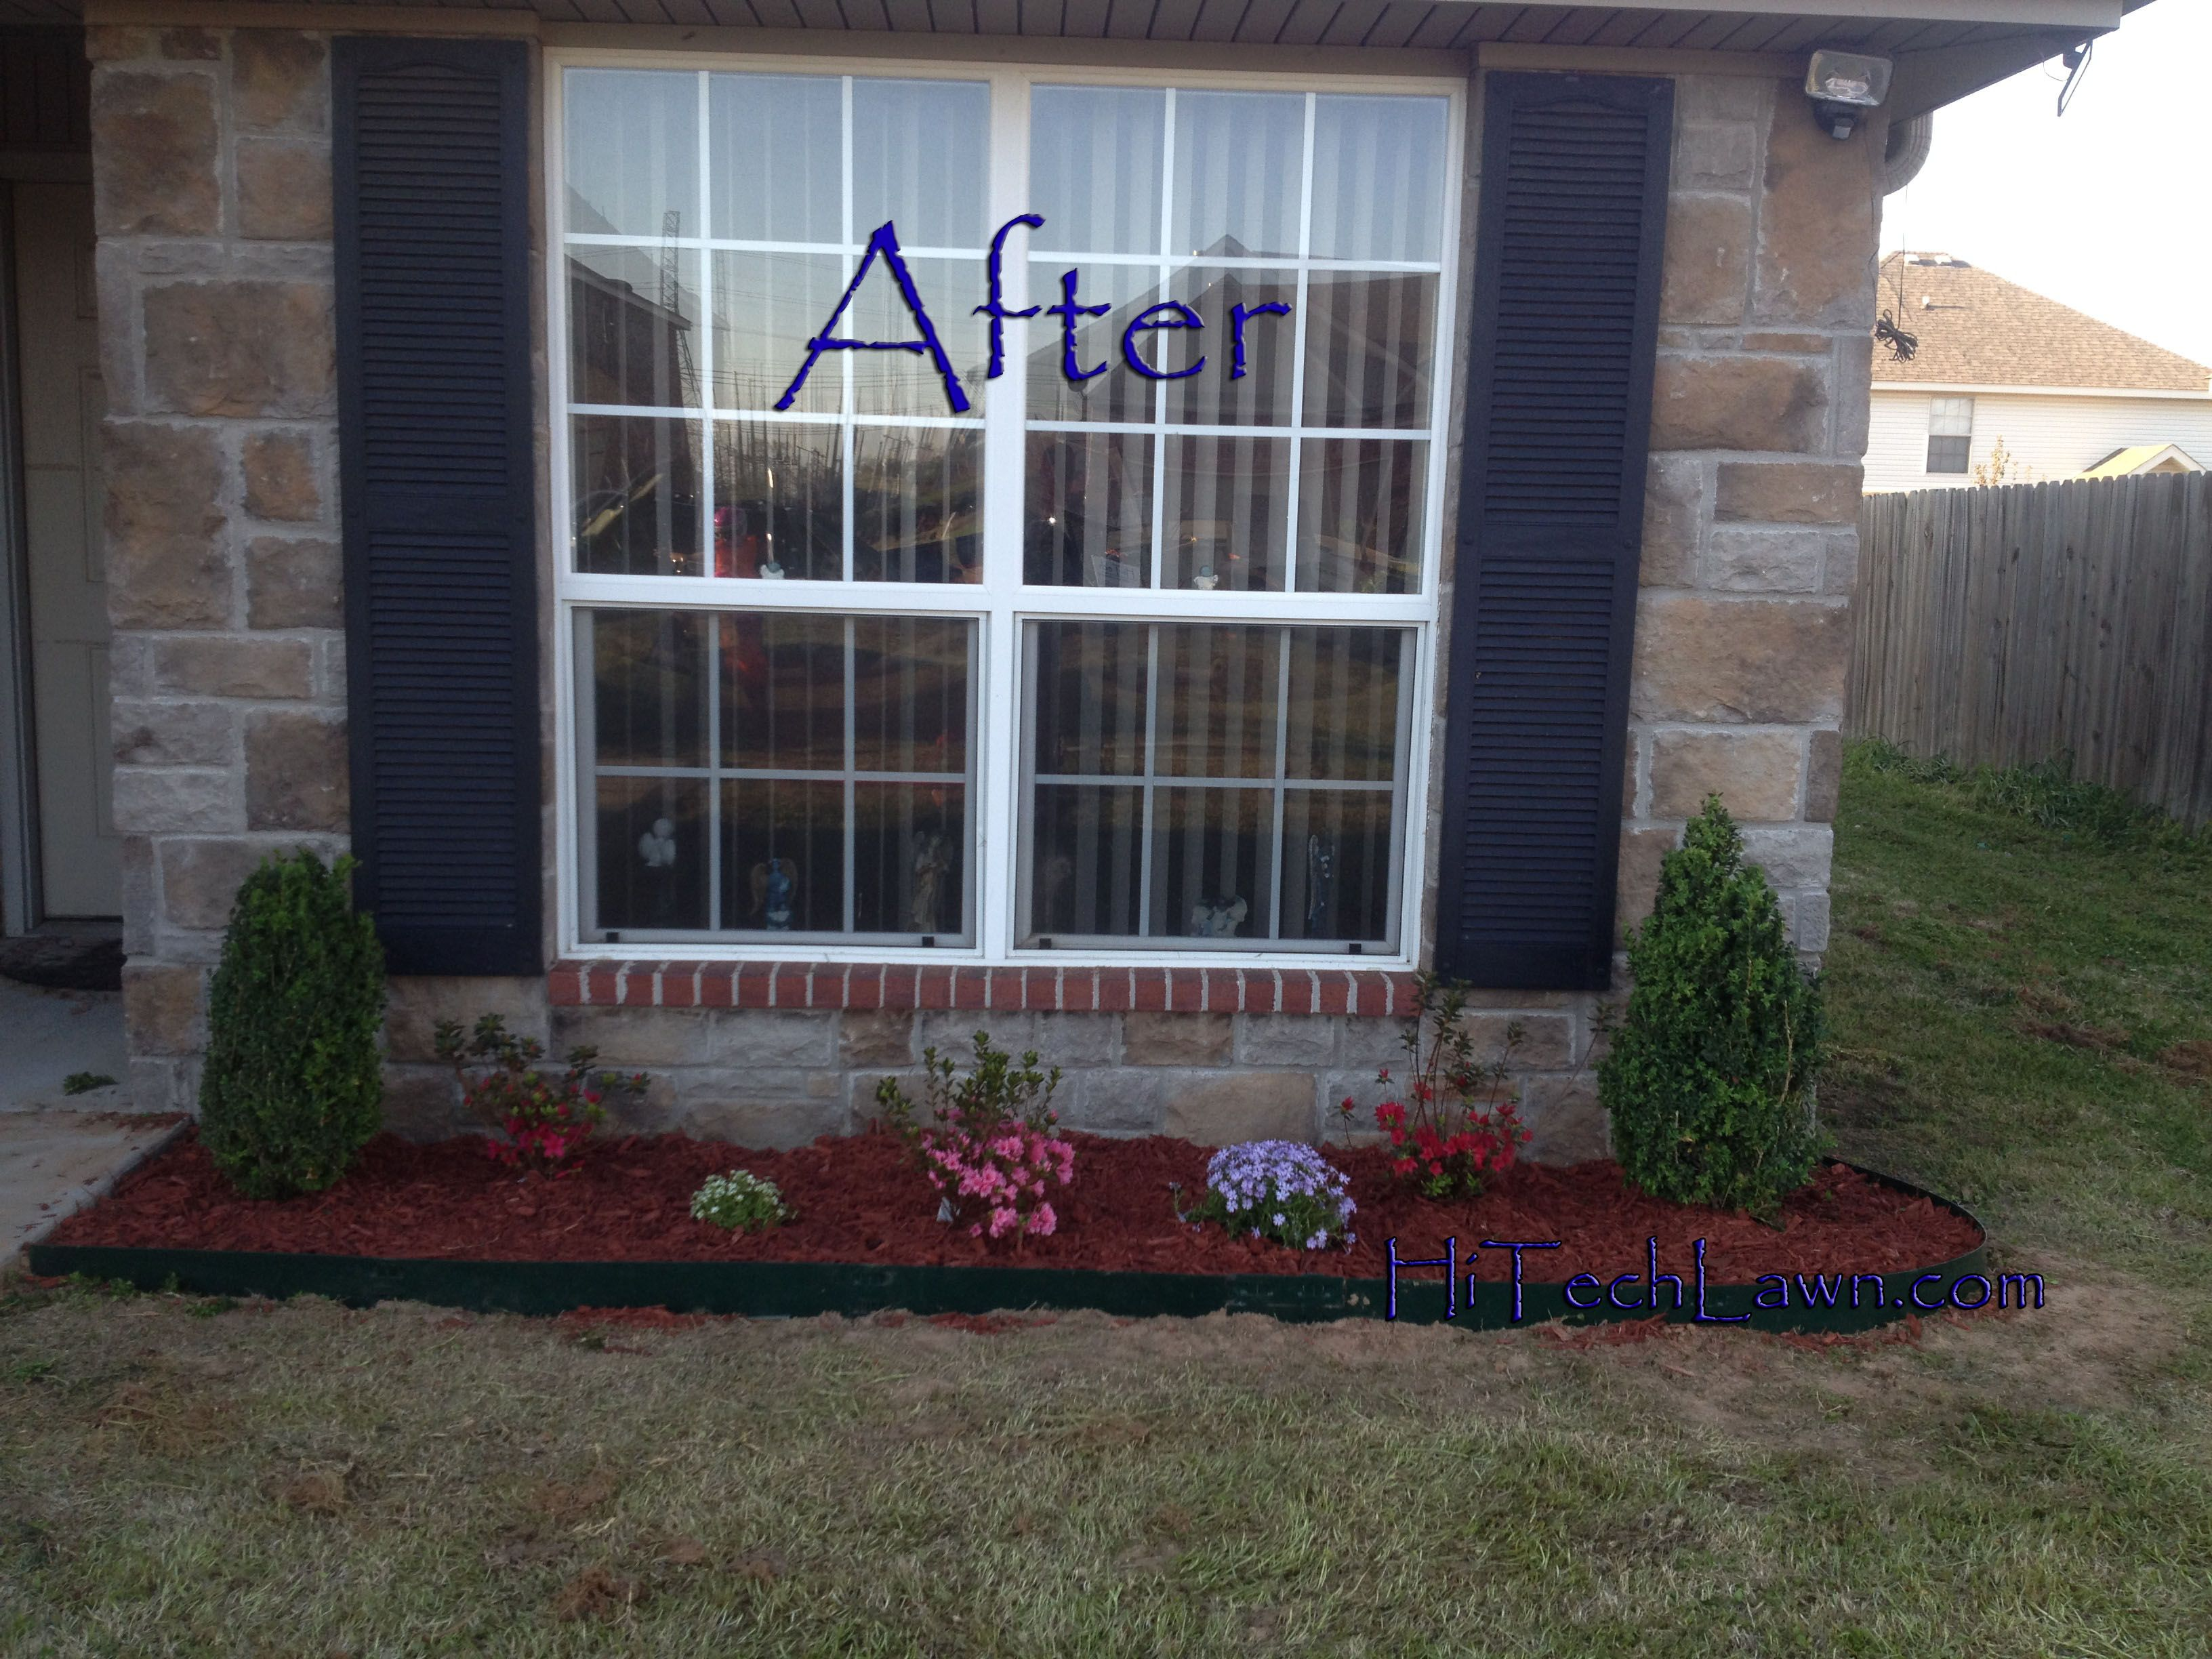 Hi Tech Lawn Care & Landscaping decorative landscaping ...